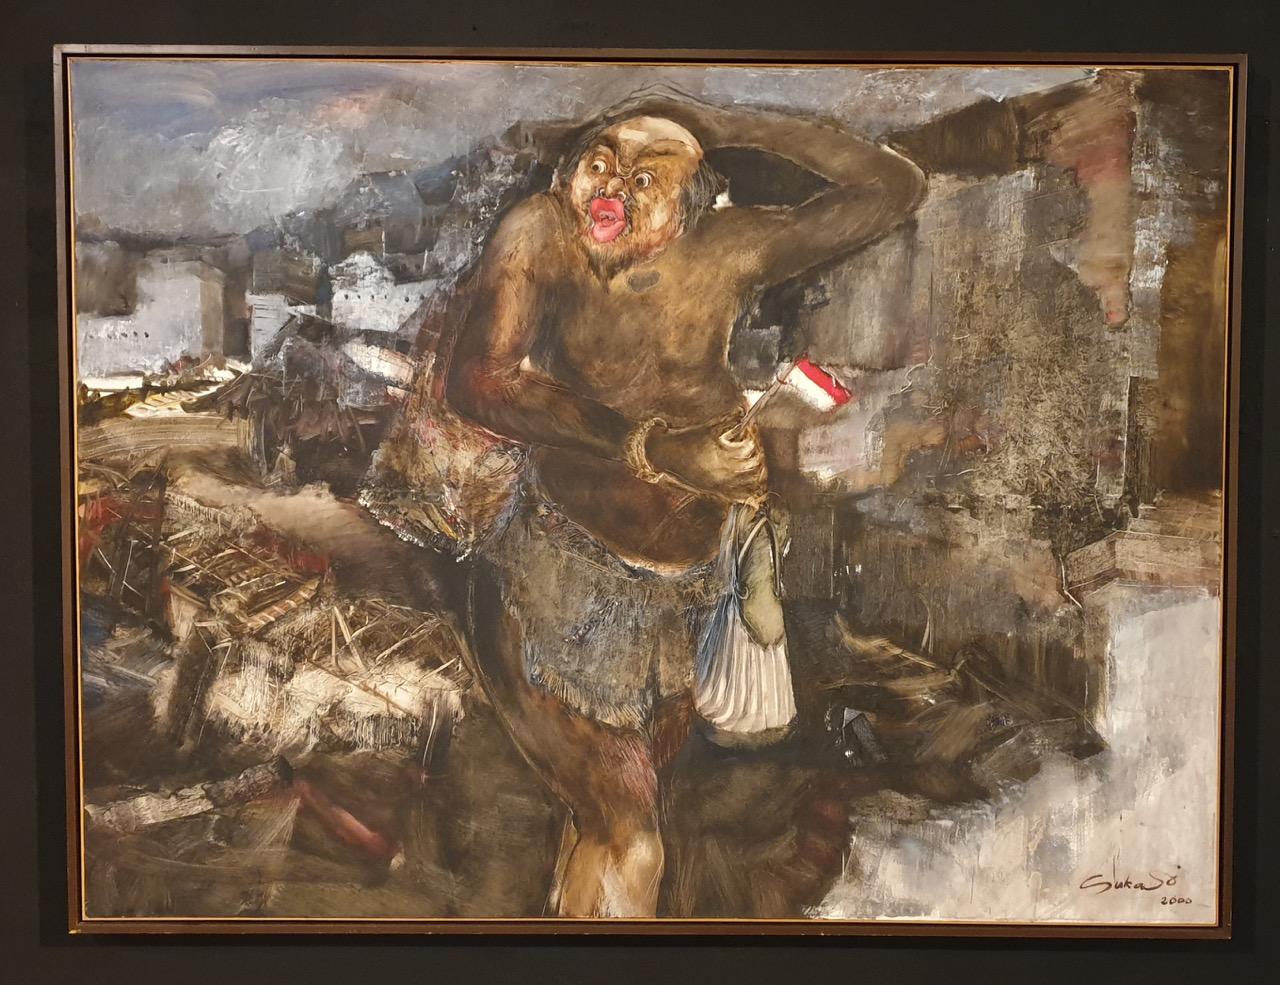 """Orang Gila"" 2000 - Nyoman Sukari, 150 x 200 cm, oil on cnvas. Image Richard Horstman"